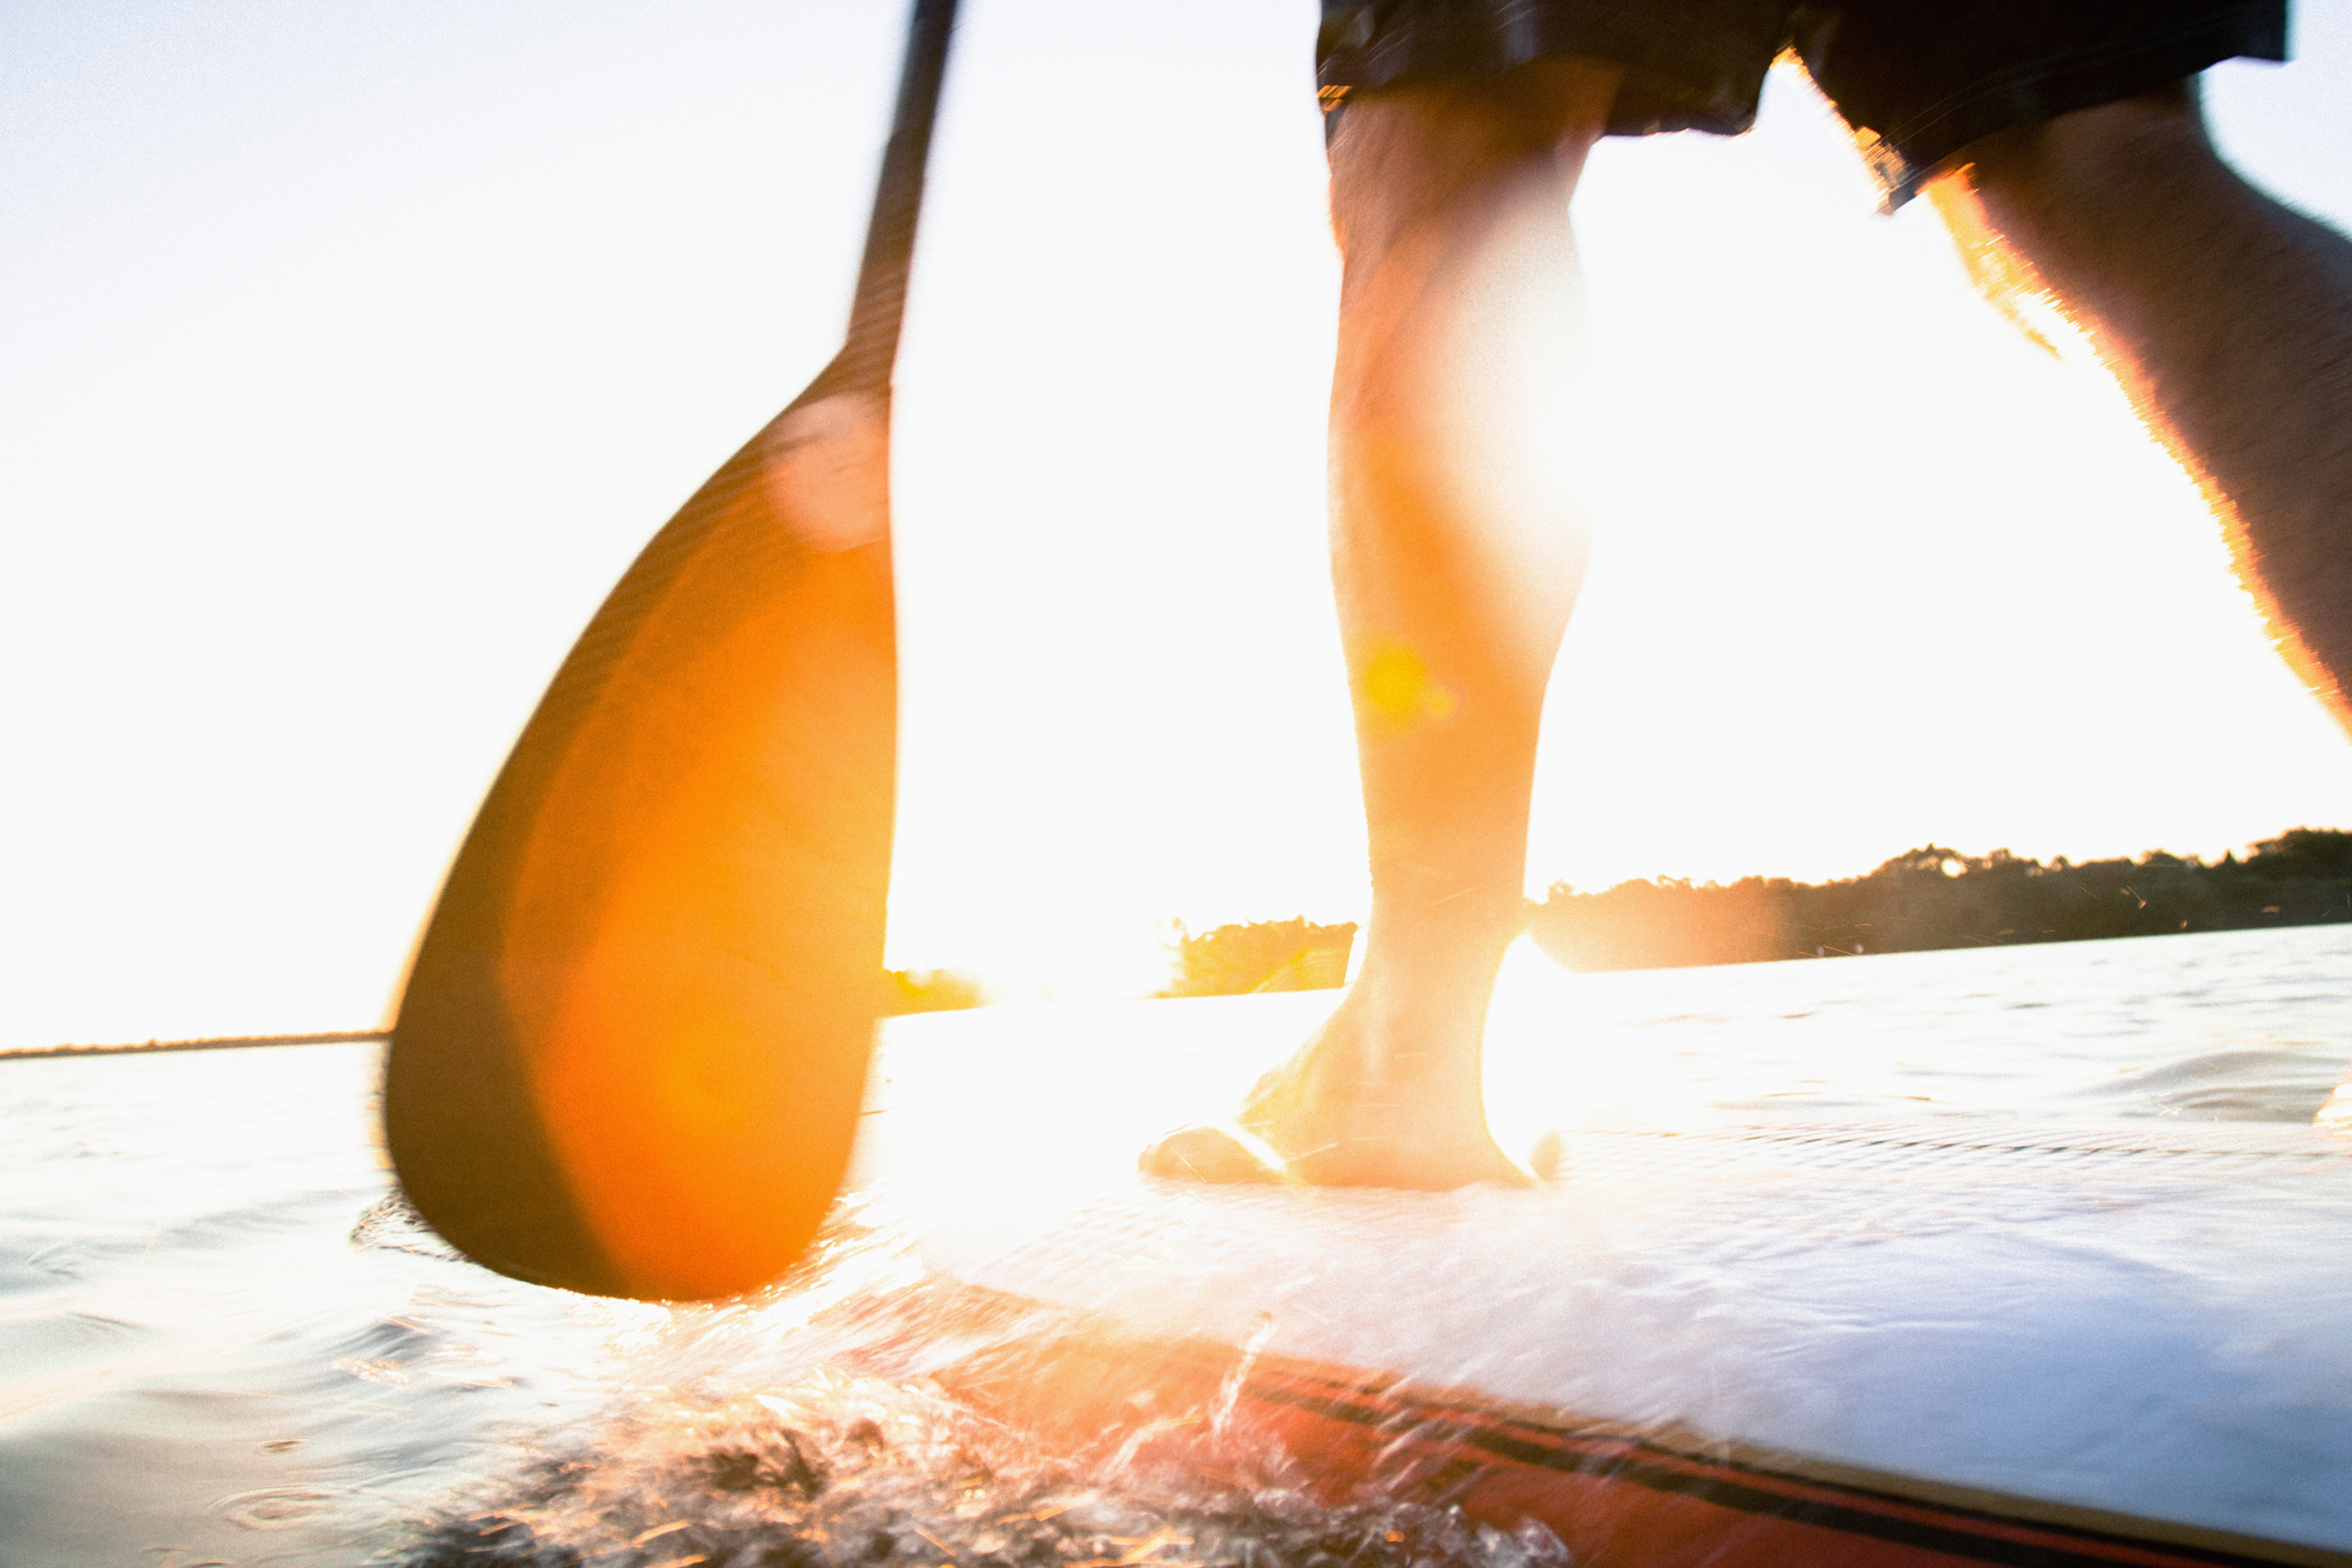 Paddleboarding - Beginners